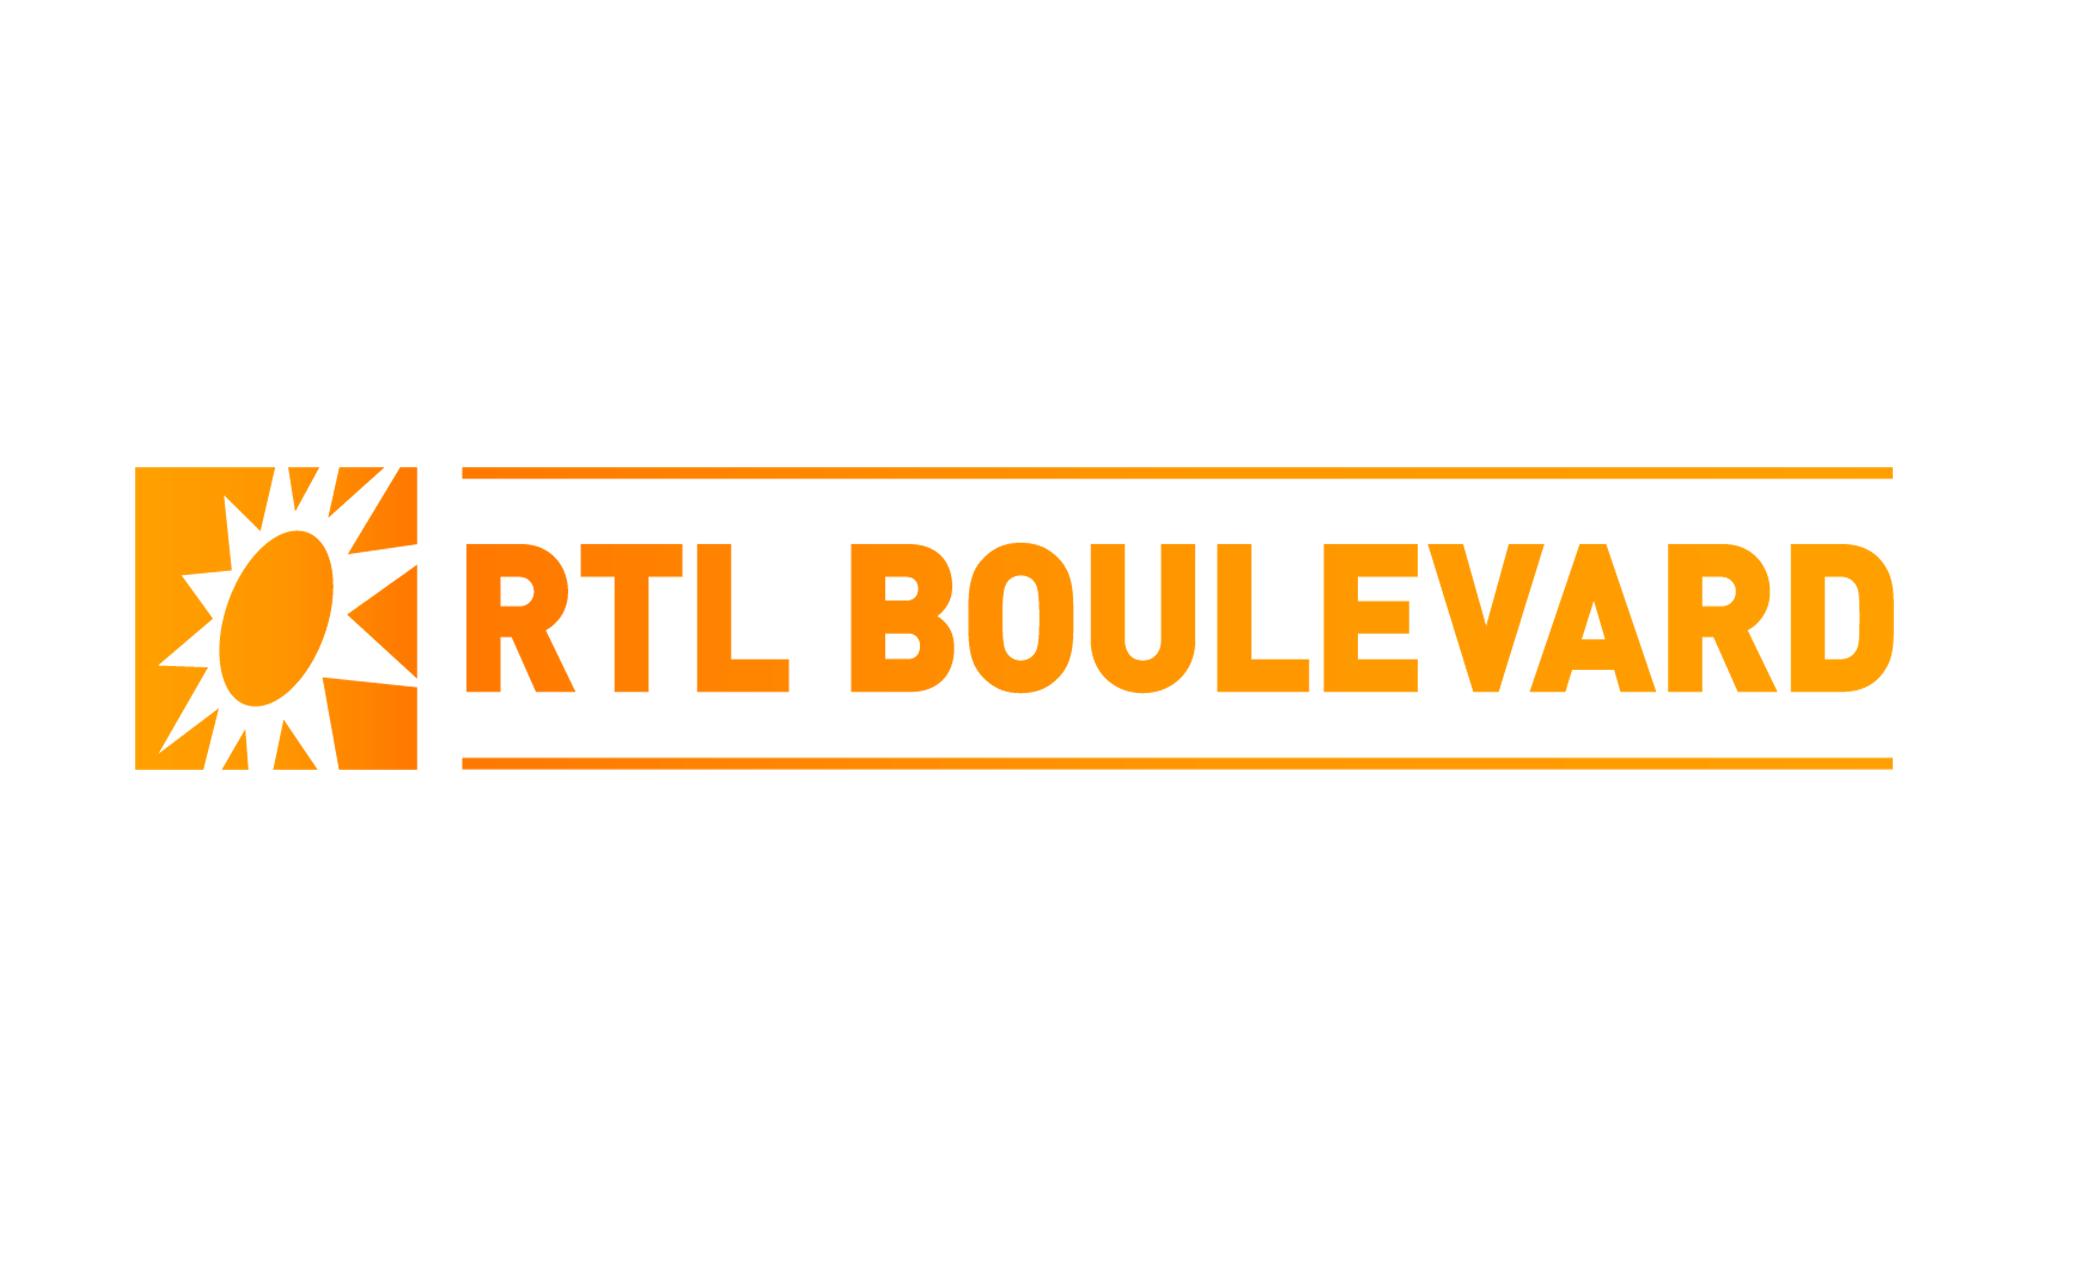 logo-rtl-boulevard